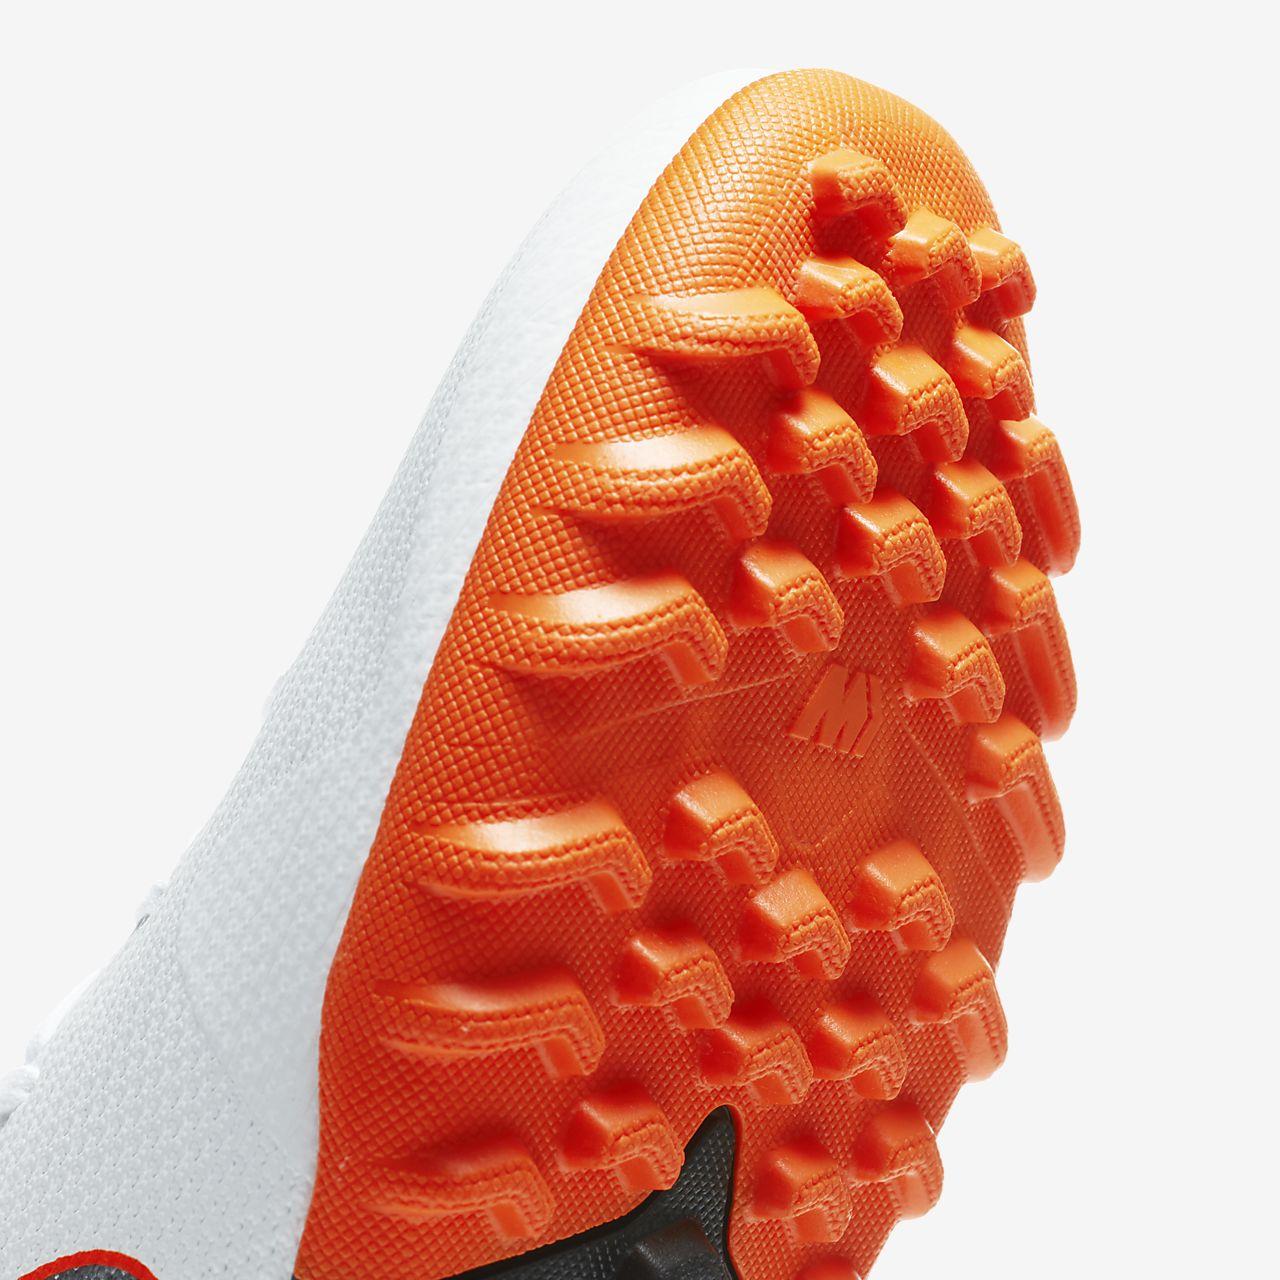 ... Nike MercurialX Superfly VI Academy Artificial-Turf Soccer Shoe